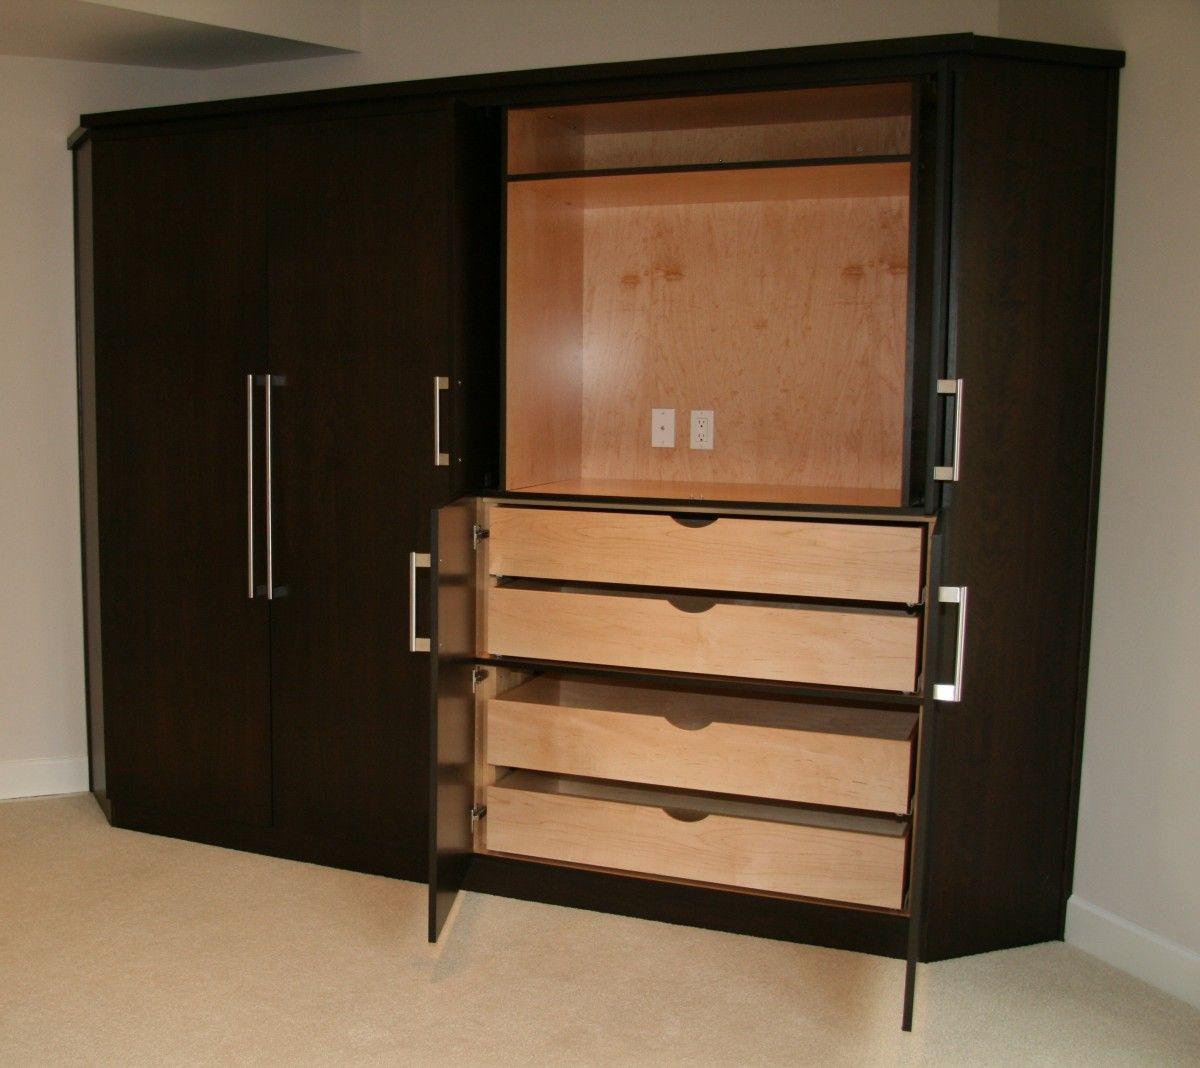 Built In Wall Unit Img 4144 Organization Storage Solutions Built In Wall Units Tall Cabinet Storage